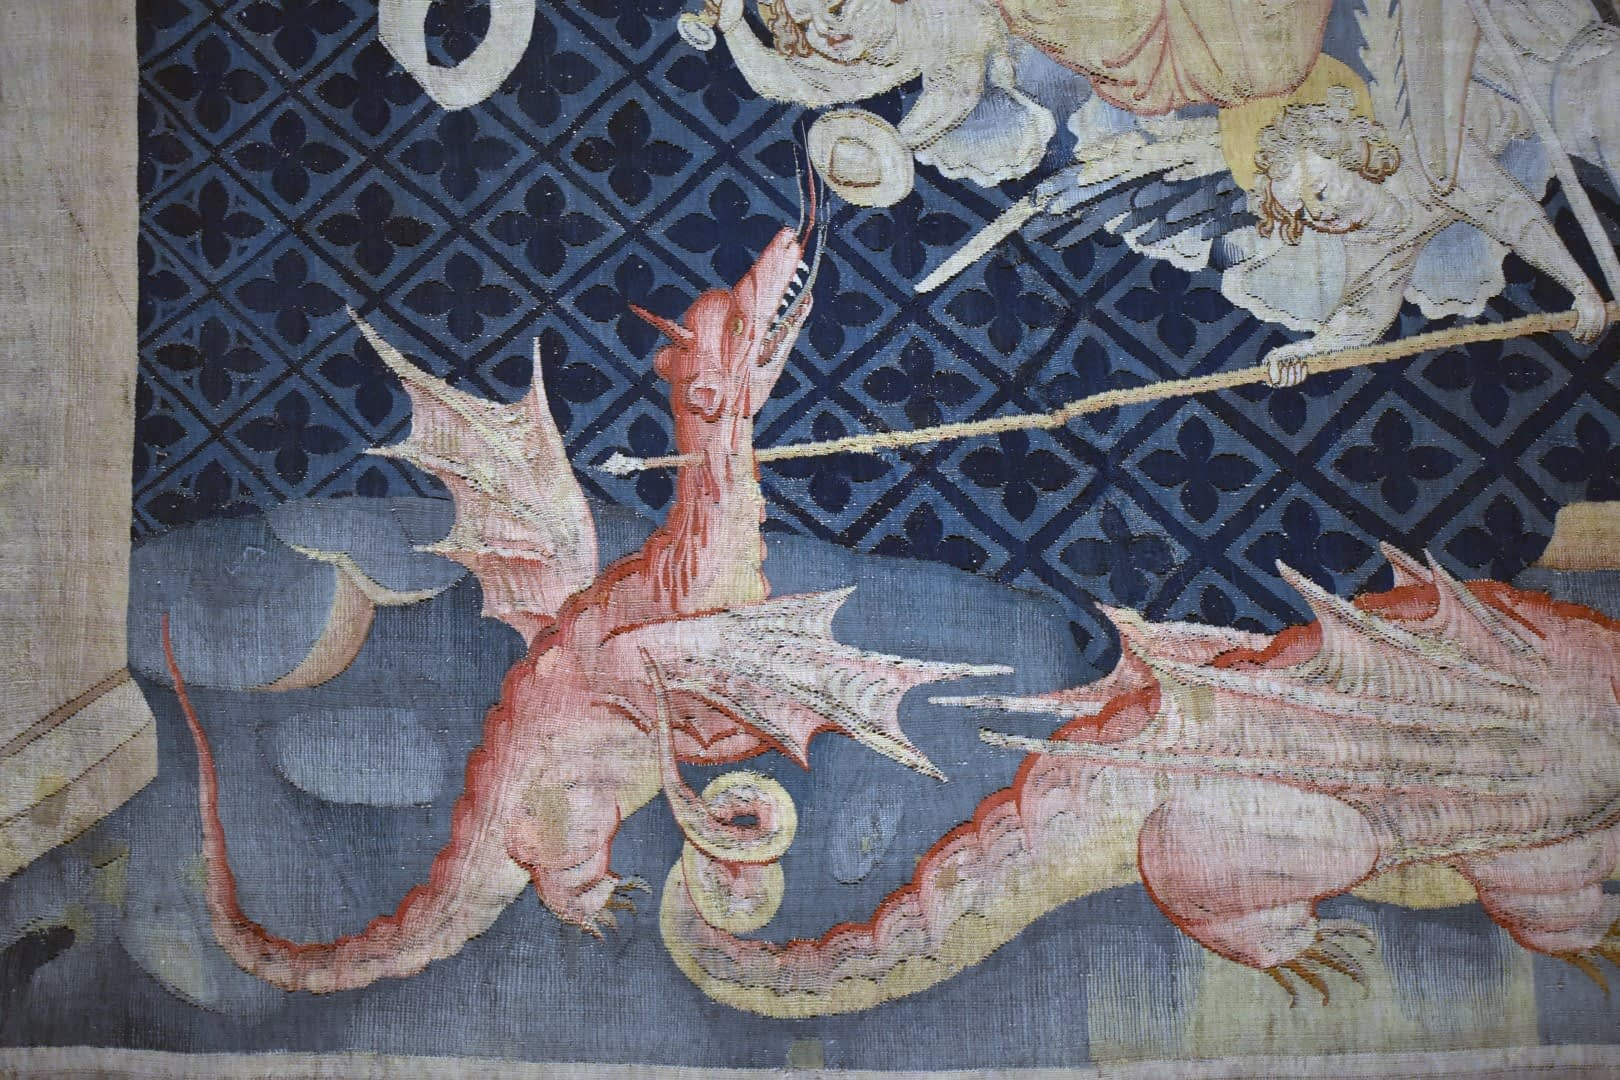 Tapisserie de l'Apocalypse, Château d'Angers